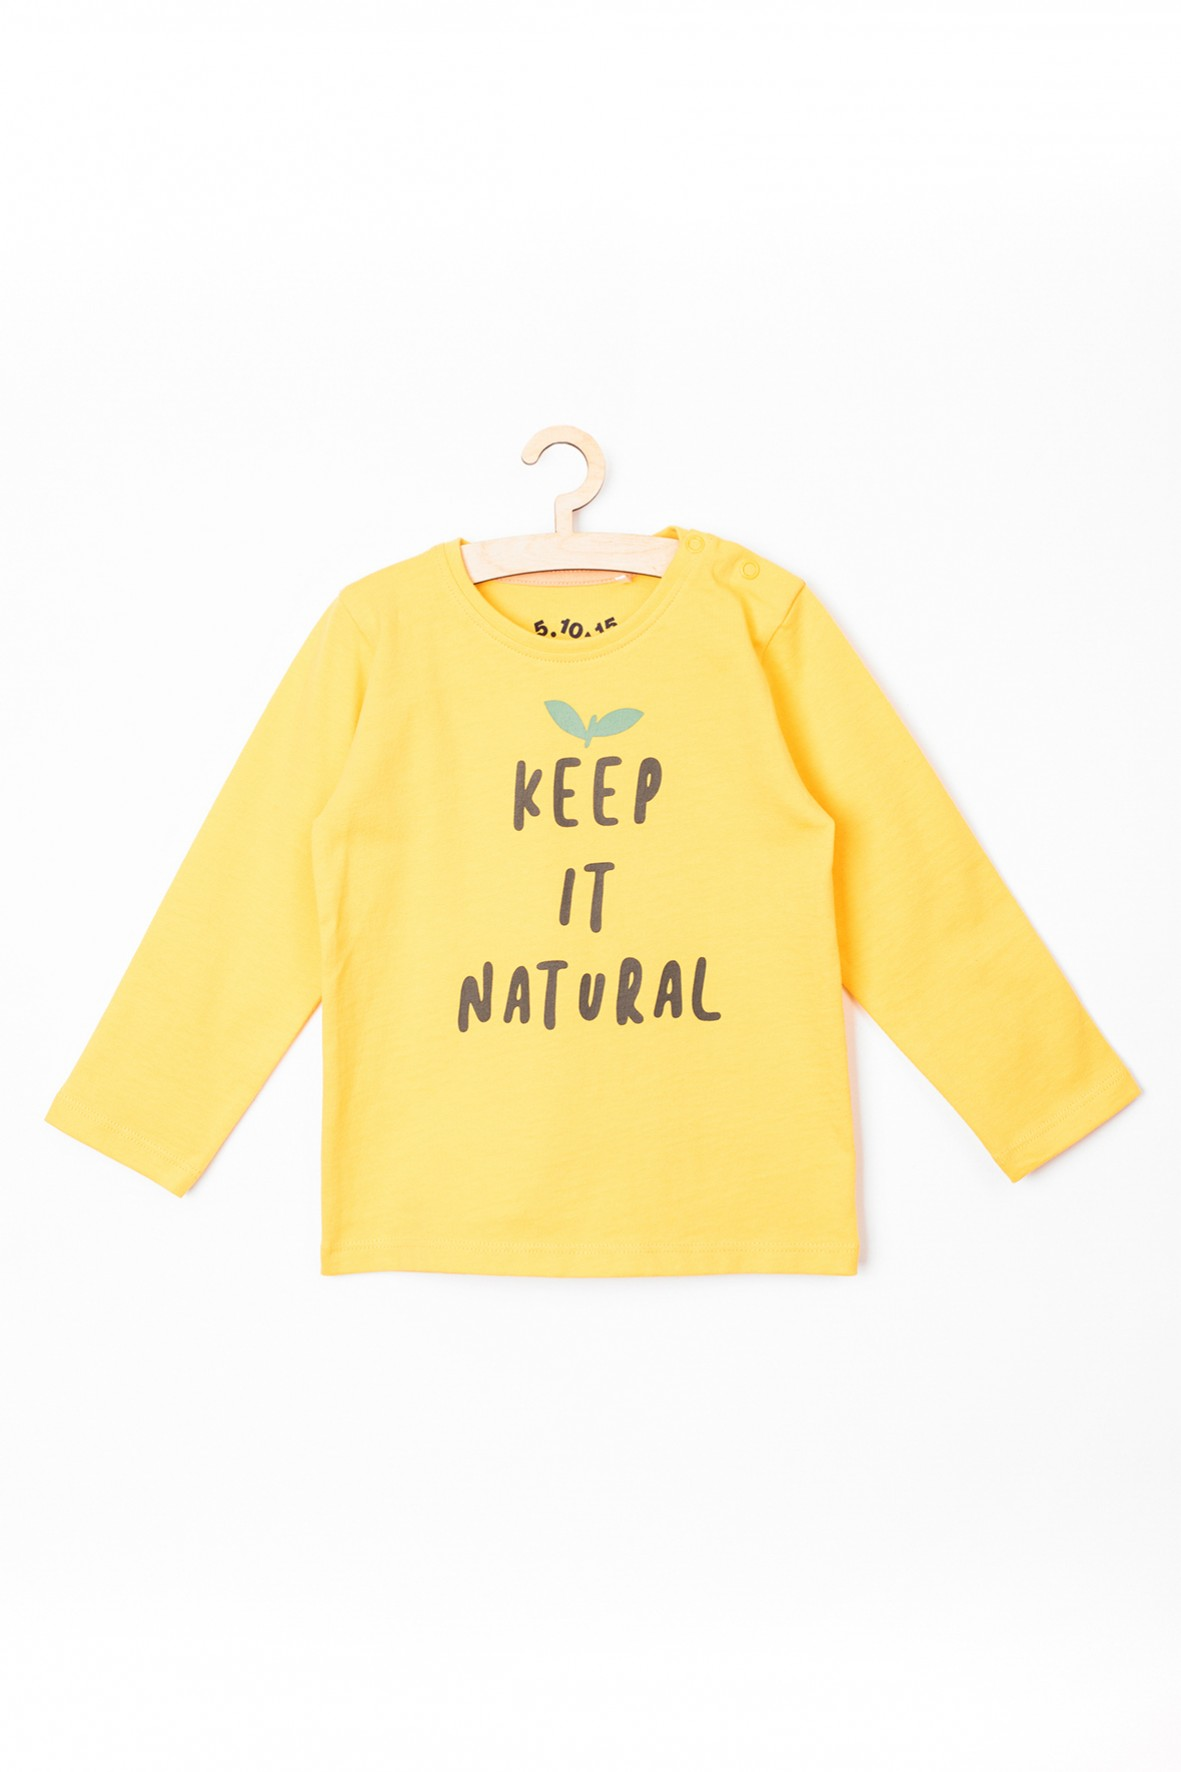 Bluzka niemowlęca żółta z napisem- Keep in natural